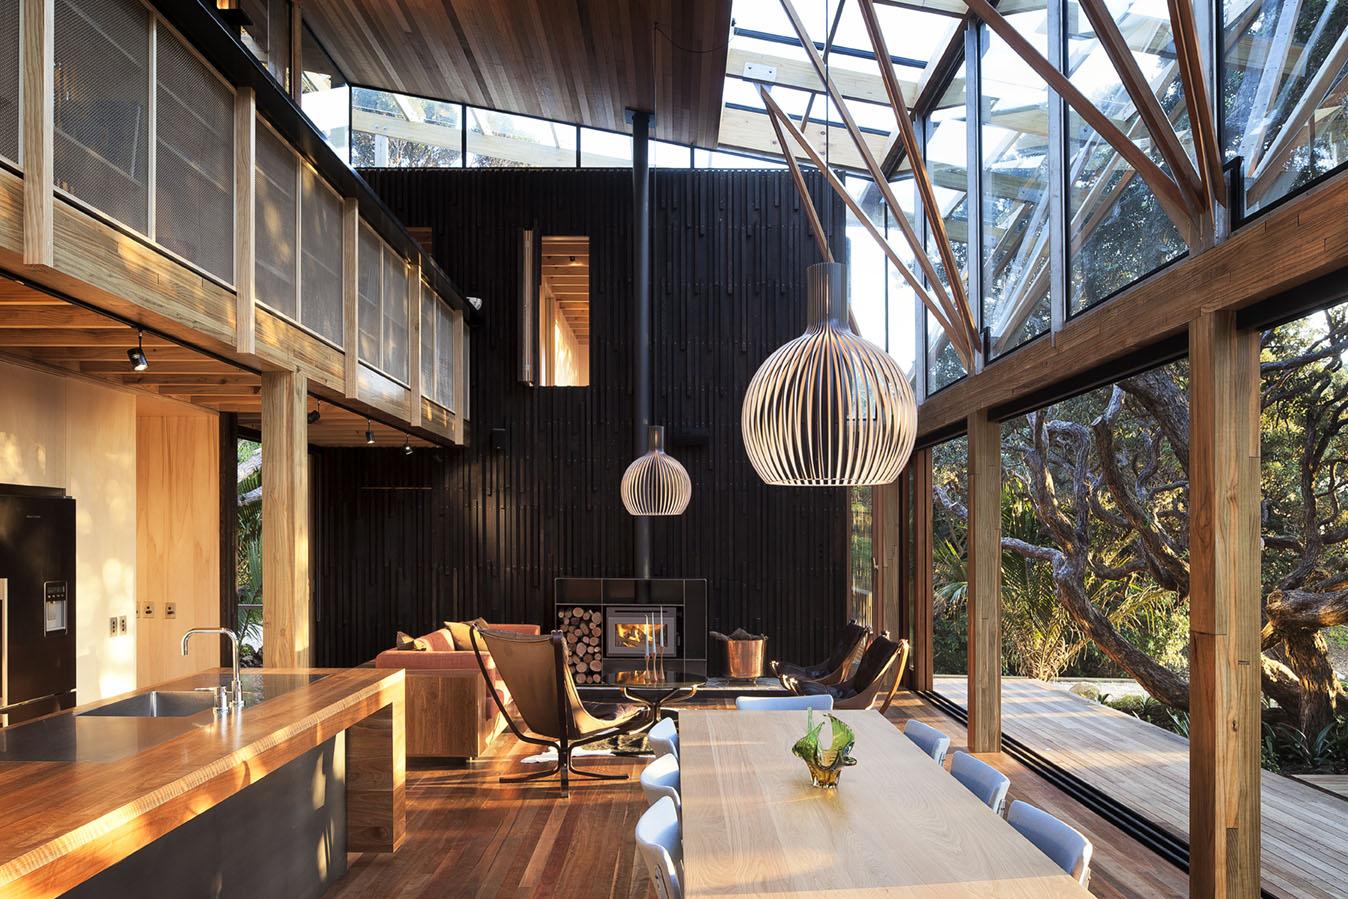 modern-house-design-transparent-interior-raw-exposed-materials4